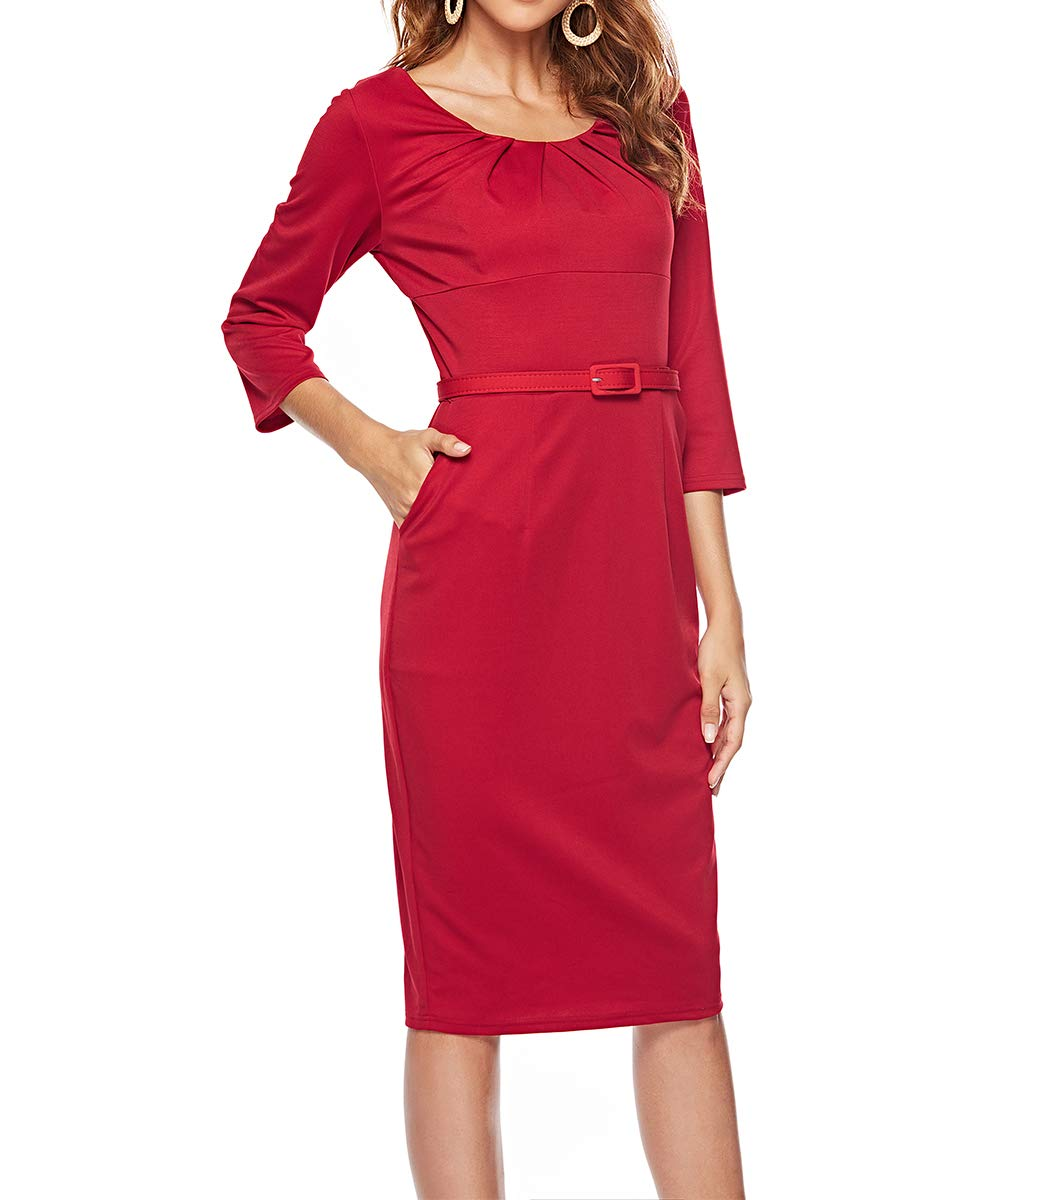 CEASIKERY Women's 3/4 Sleeve Vintage Pleated Business Wear to Work Pencil Dress 48